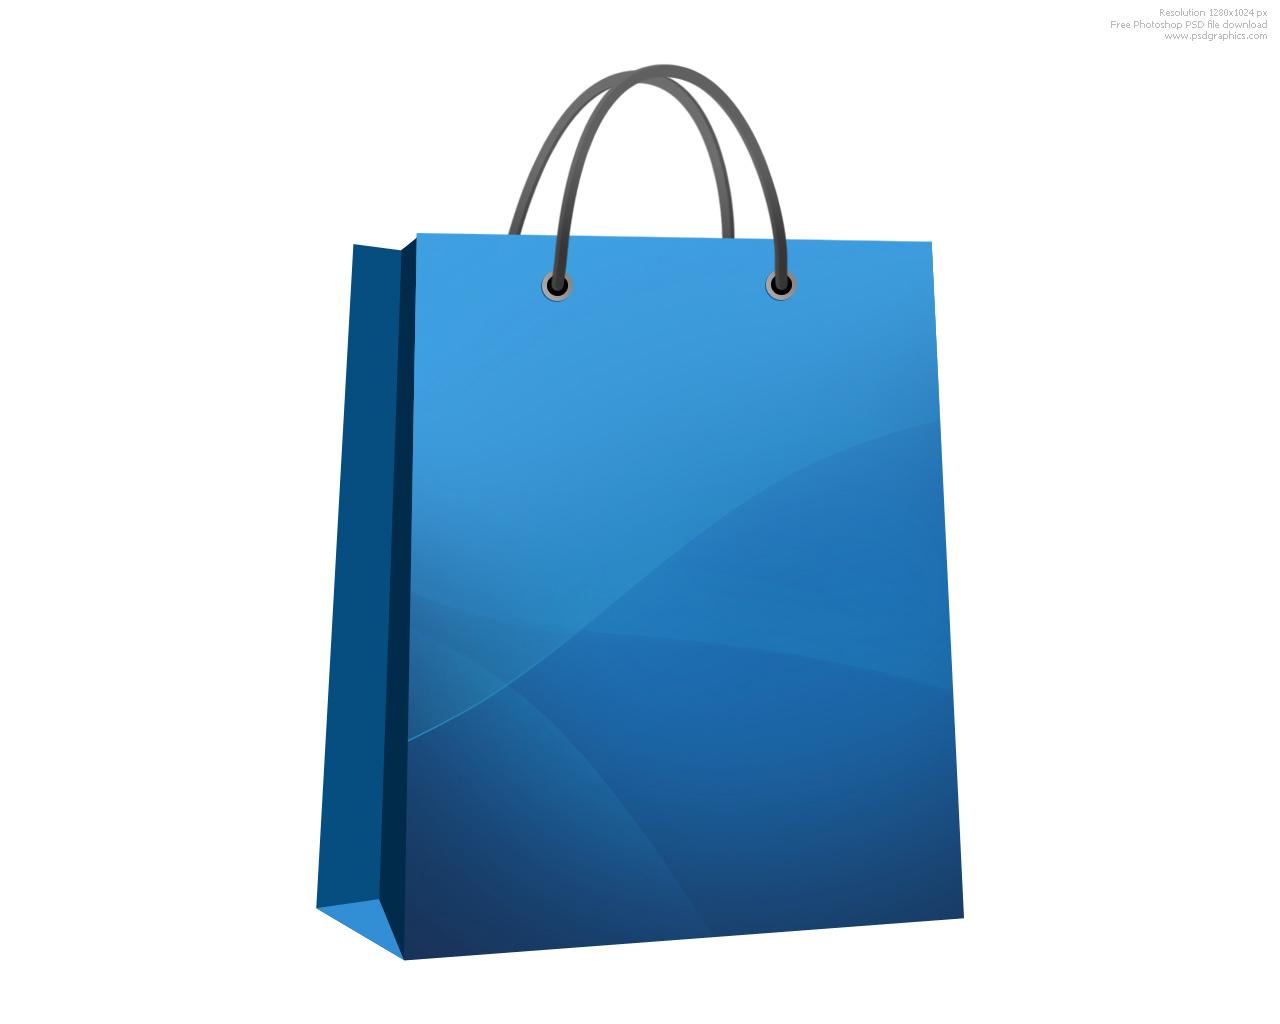 Blue Shopping Bags Clipart.